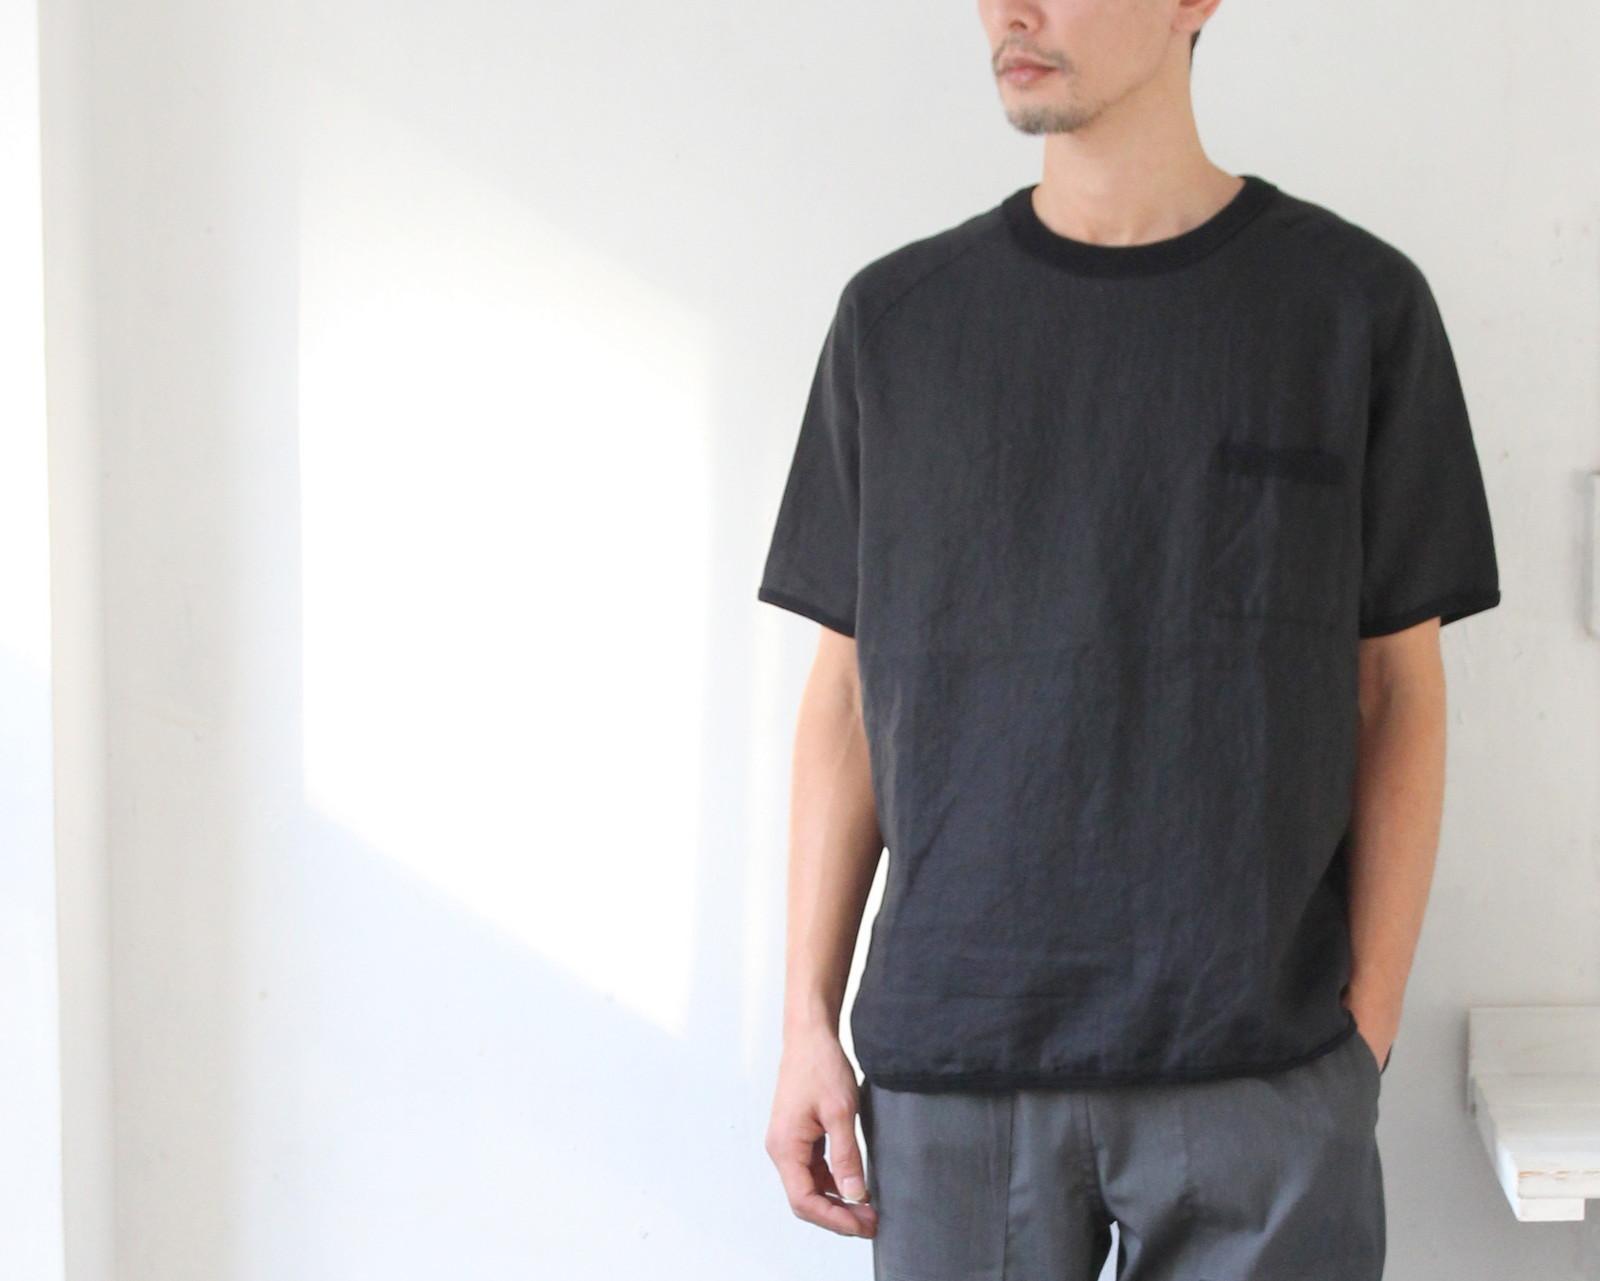 French Linen T-shirt_c0379477_05430078.jpg